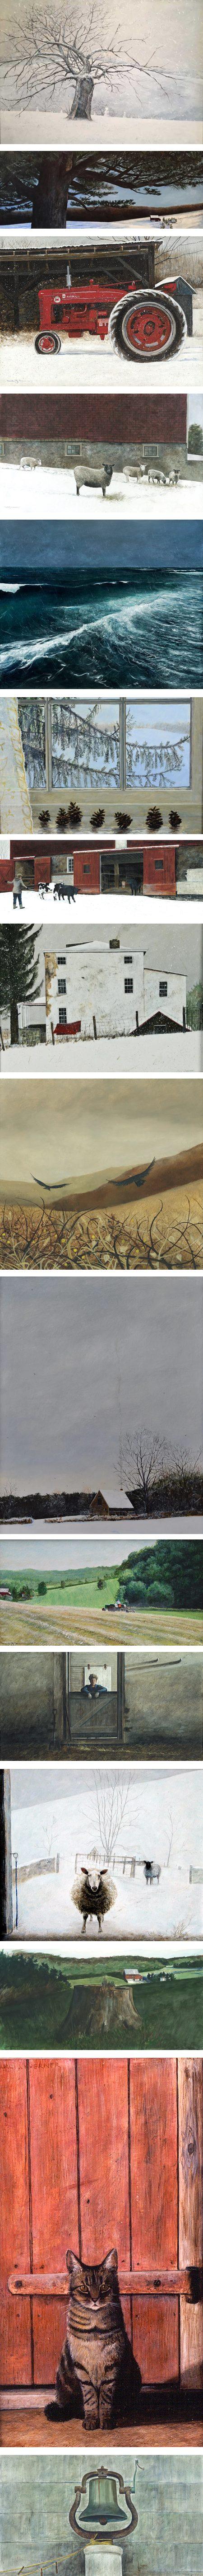 Karl J. Kuerner, painter in the Brandywine Tradition